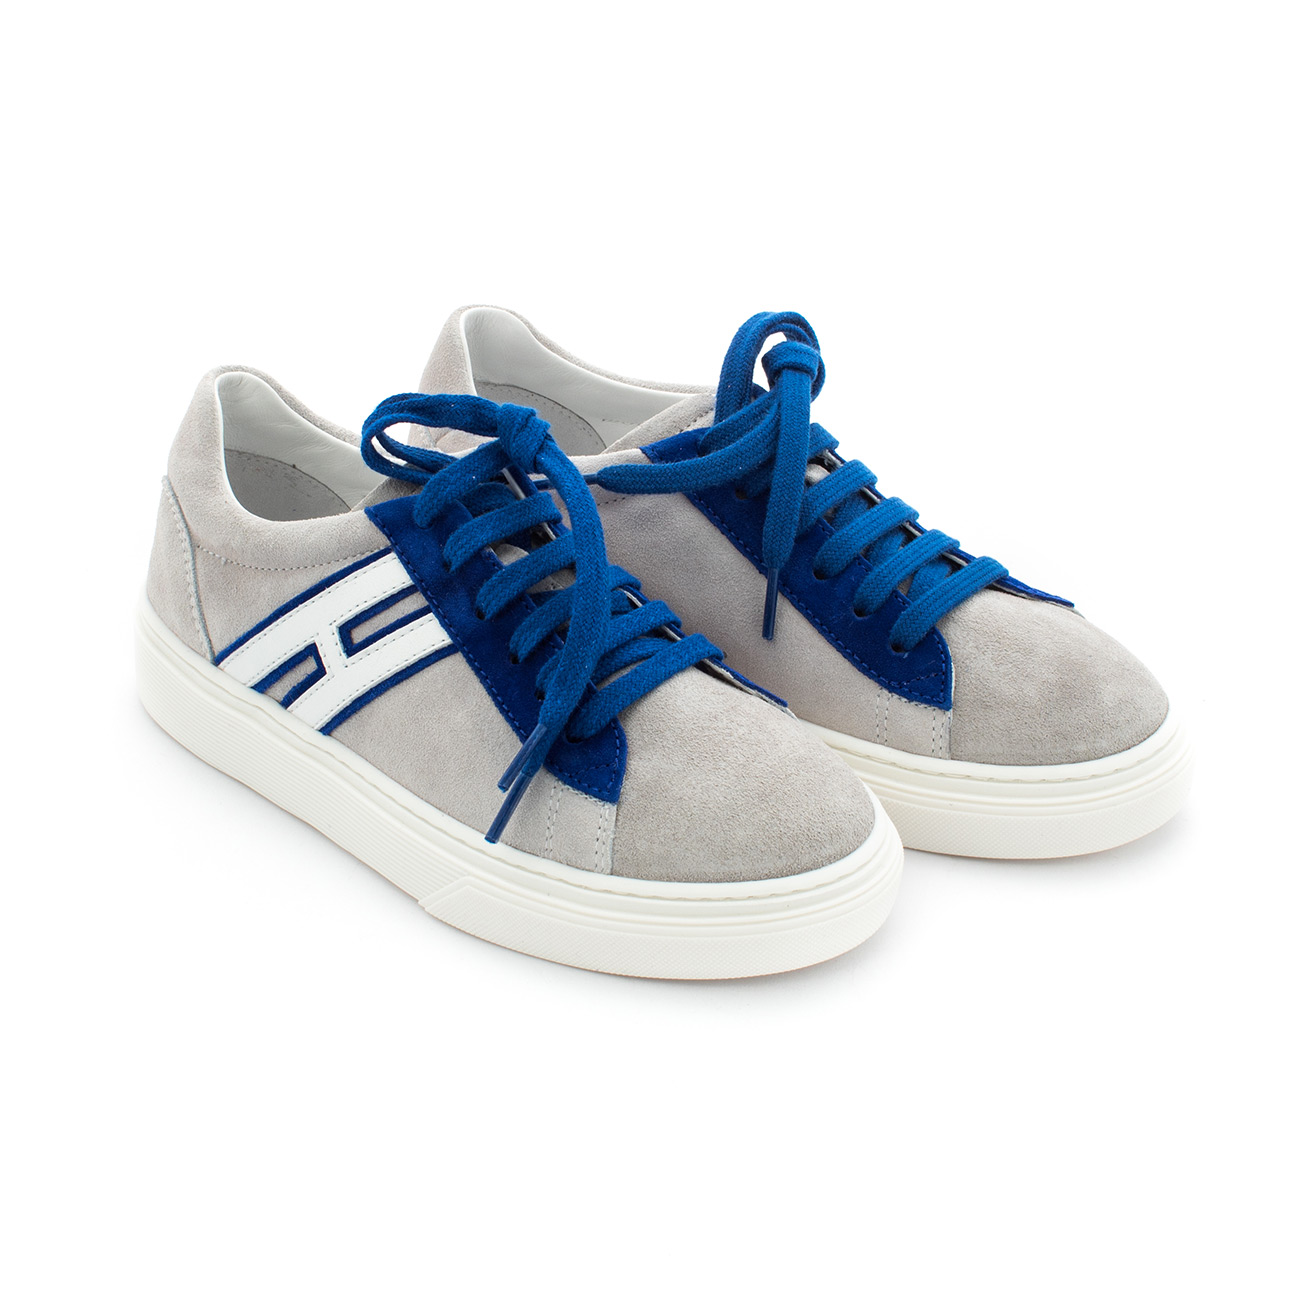 Scarpa Sneaker H365 Grigia E Blu Bambino Jr